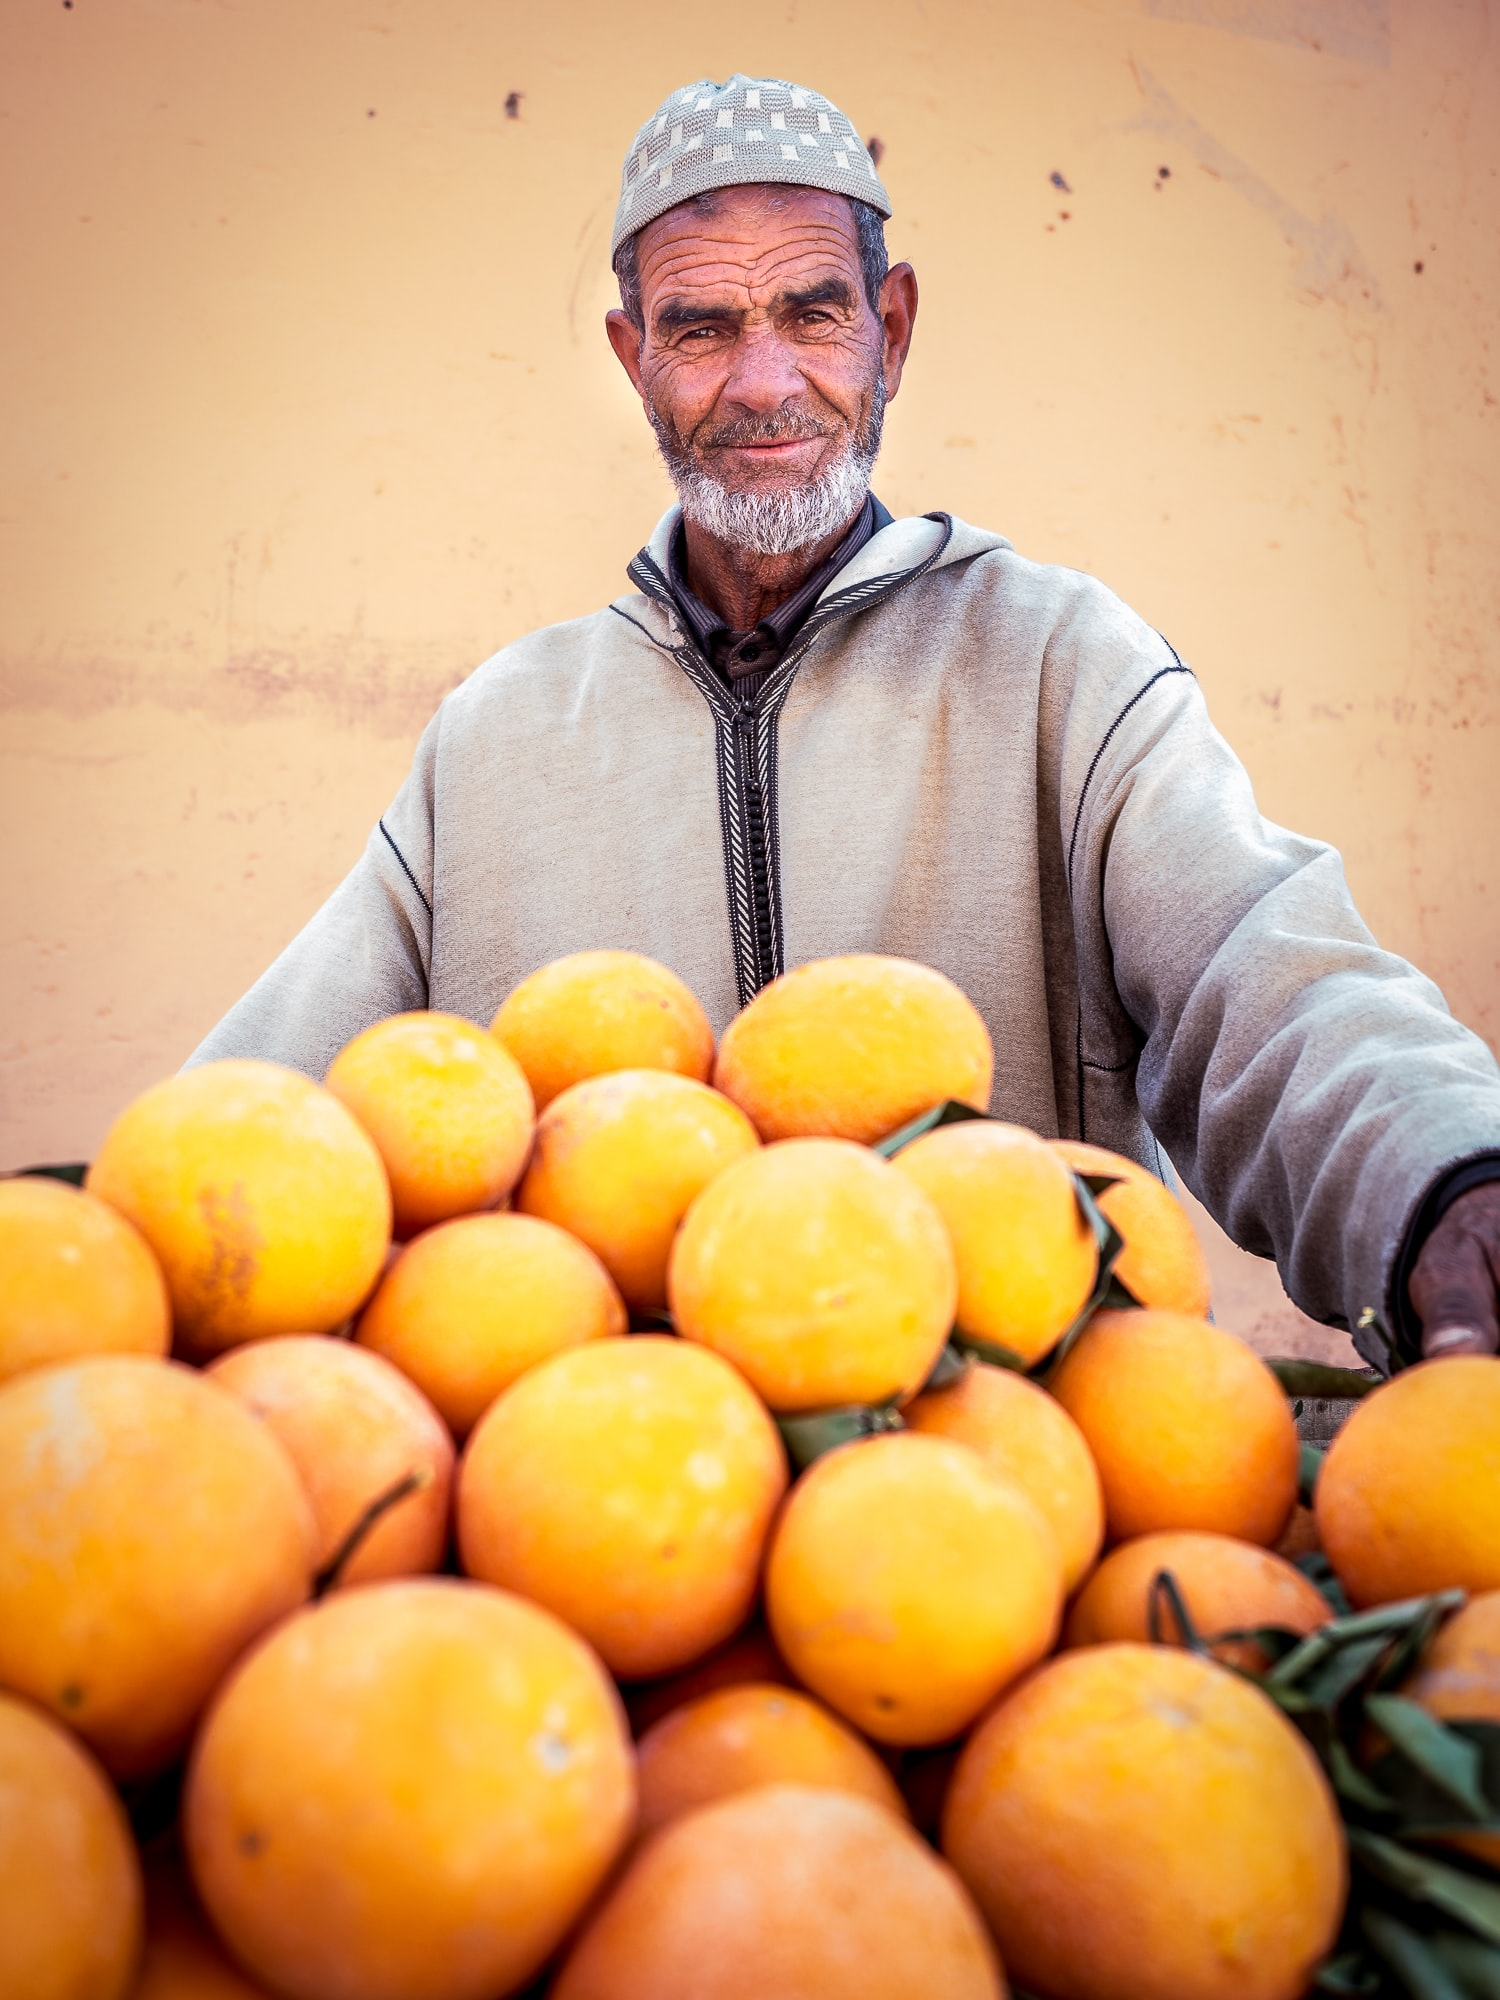 man holding oranges